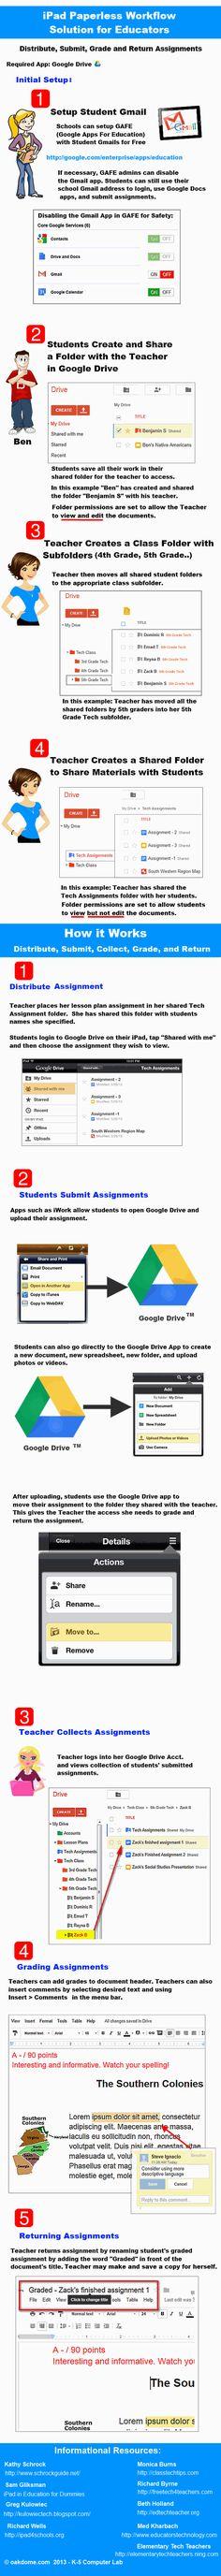 iPad Paperless Workflow for Educators